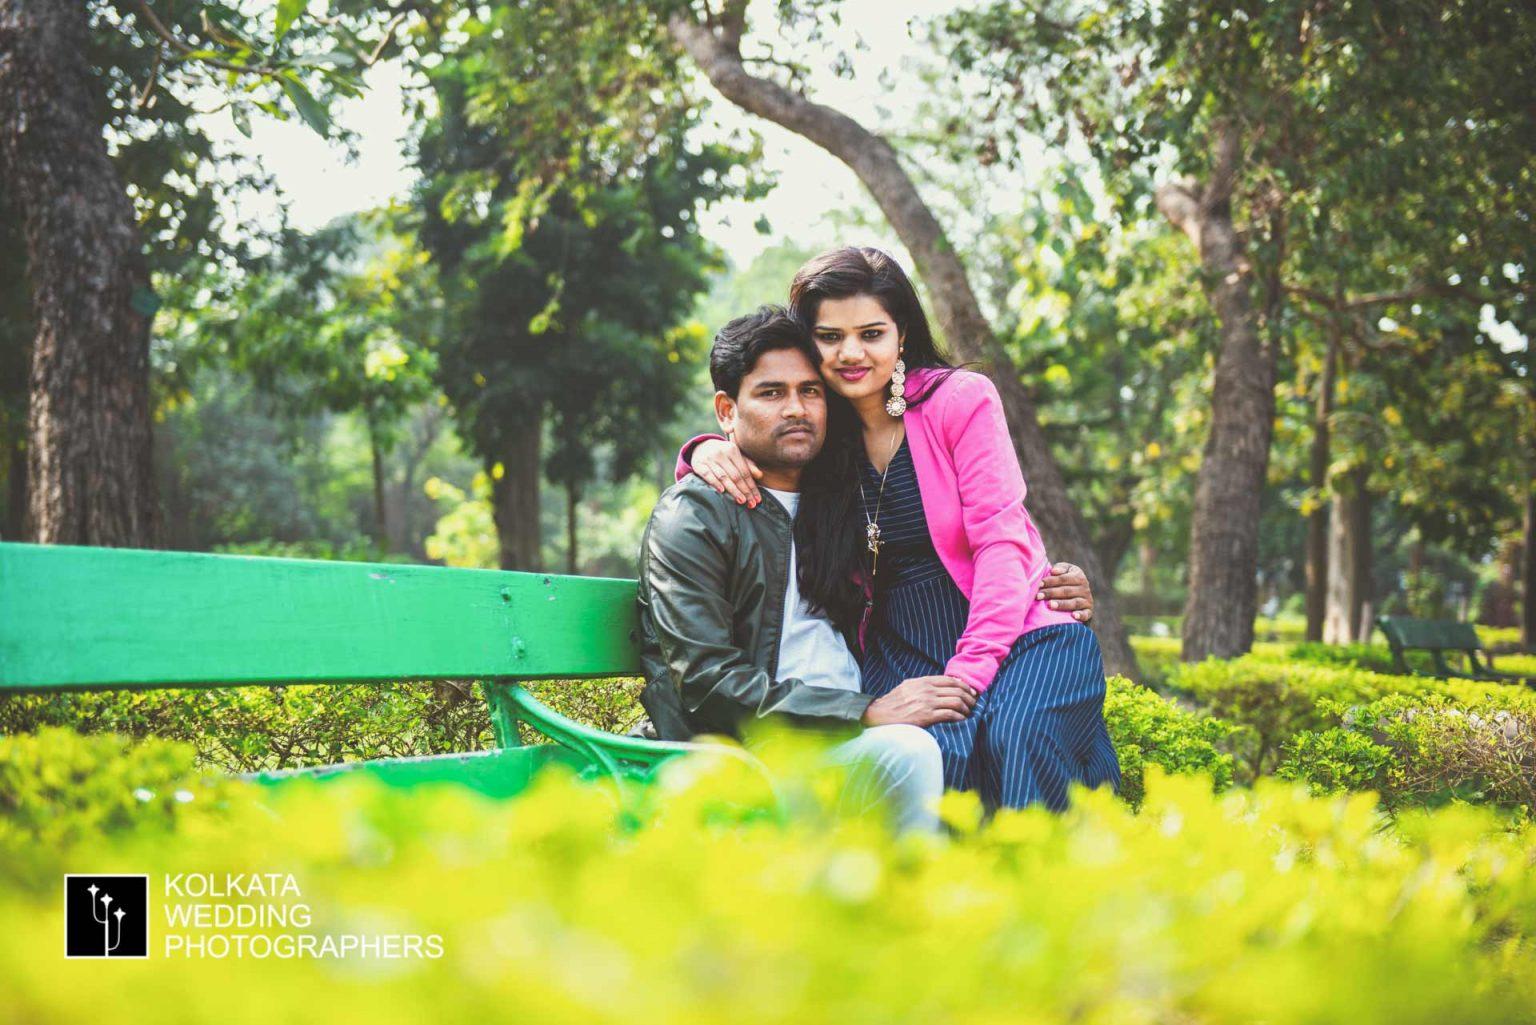 Pre Wedding Photography in Kolkata